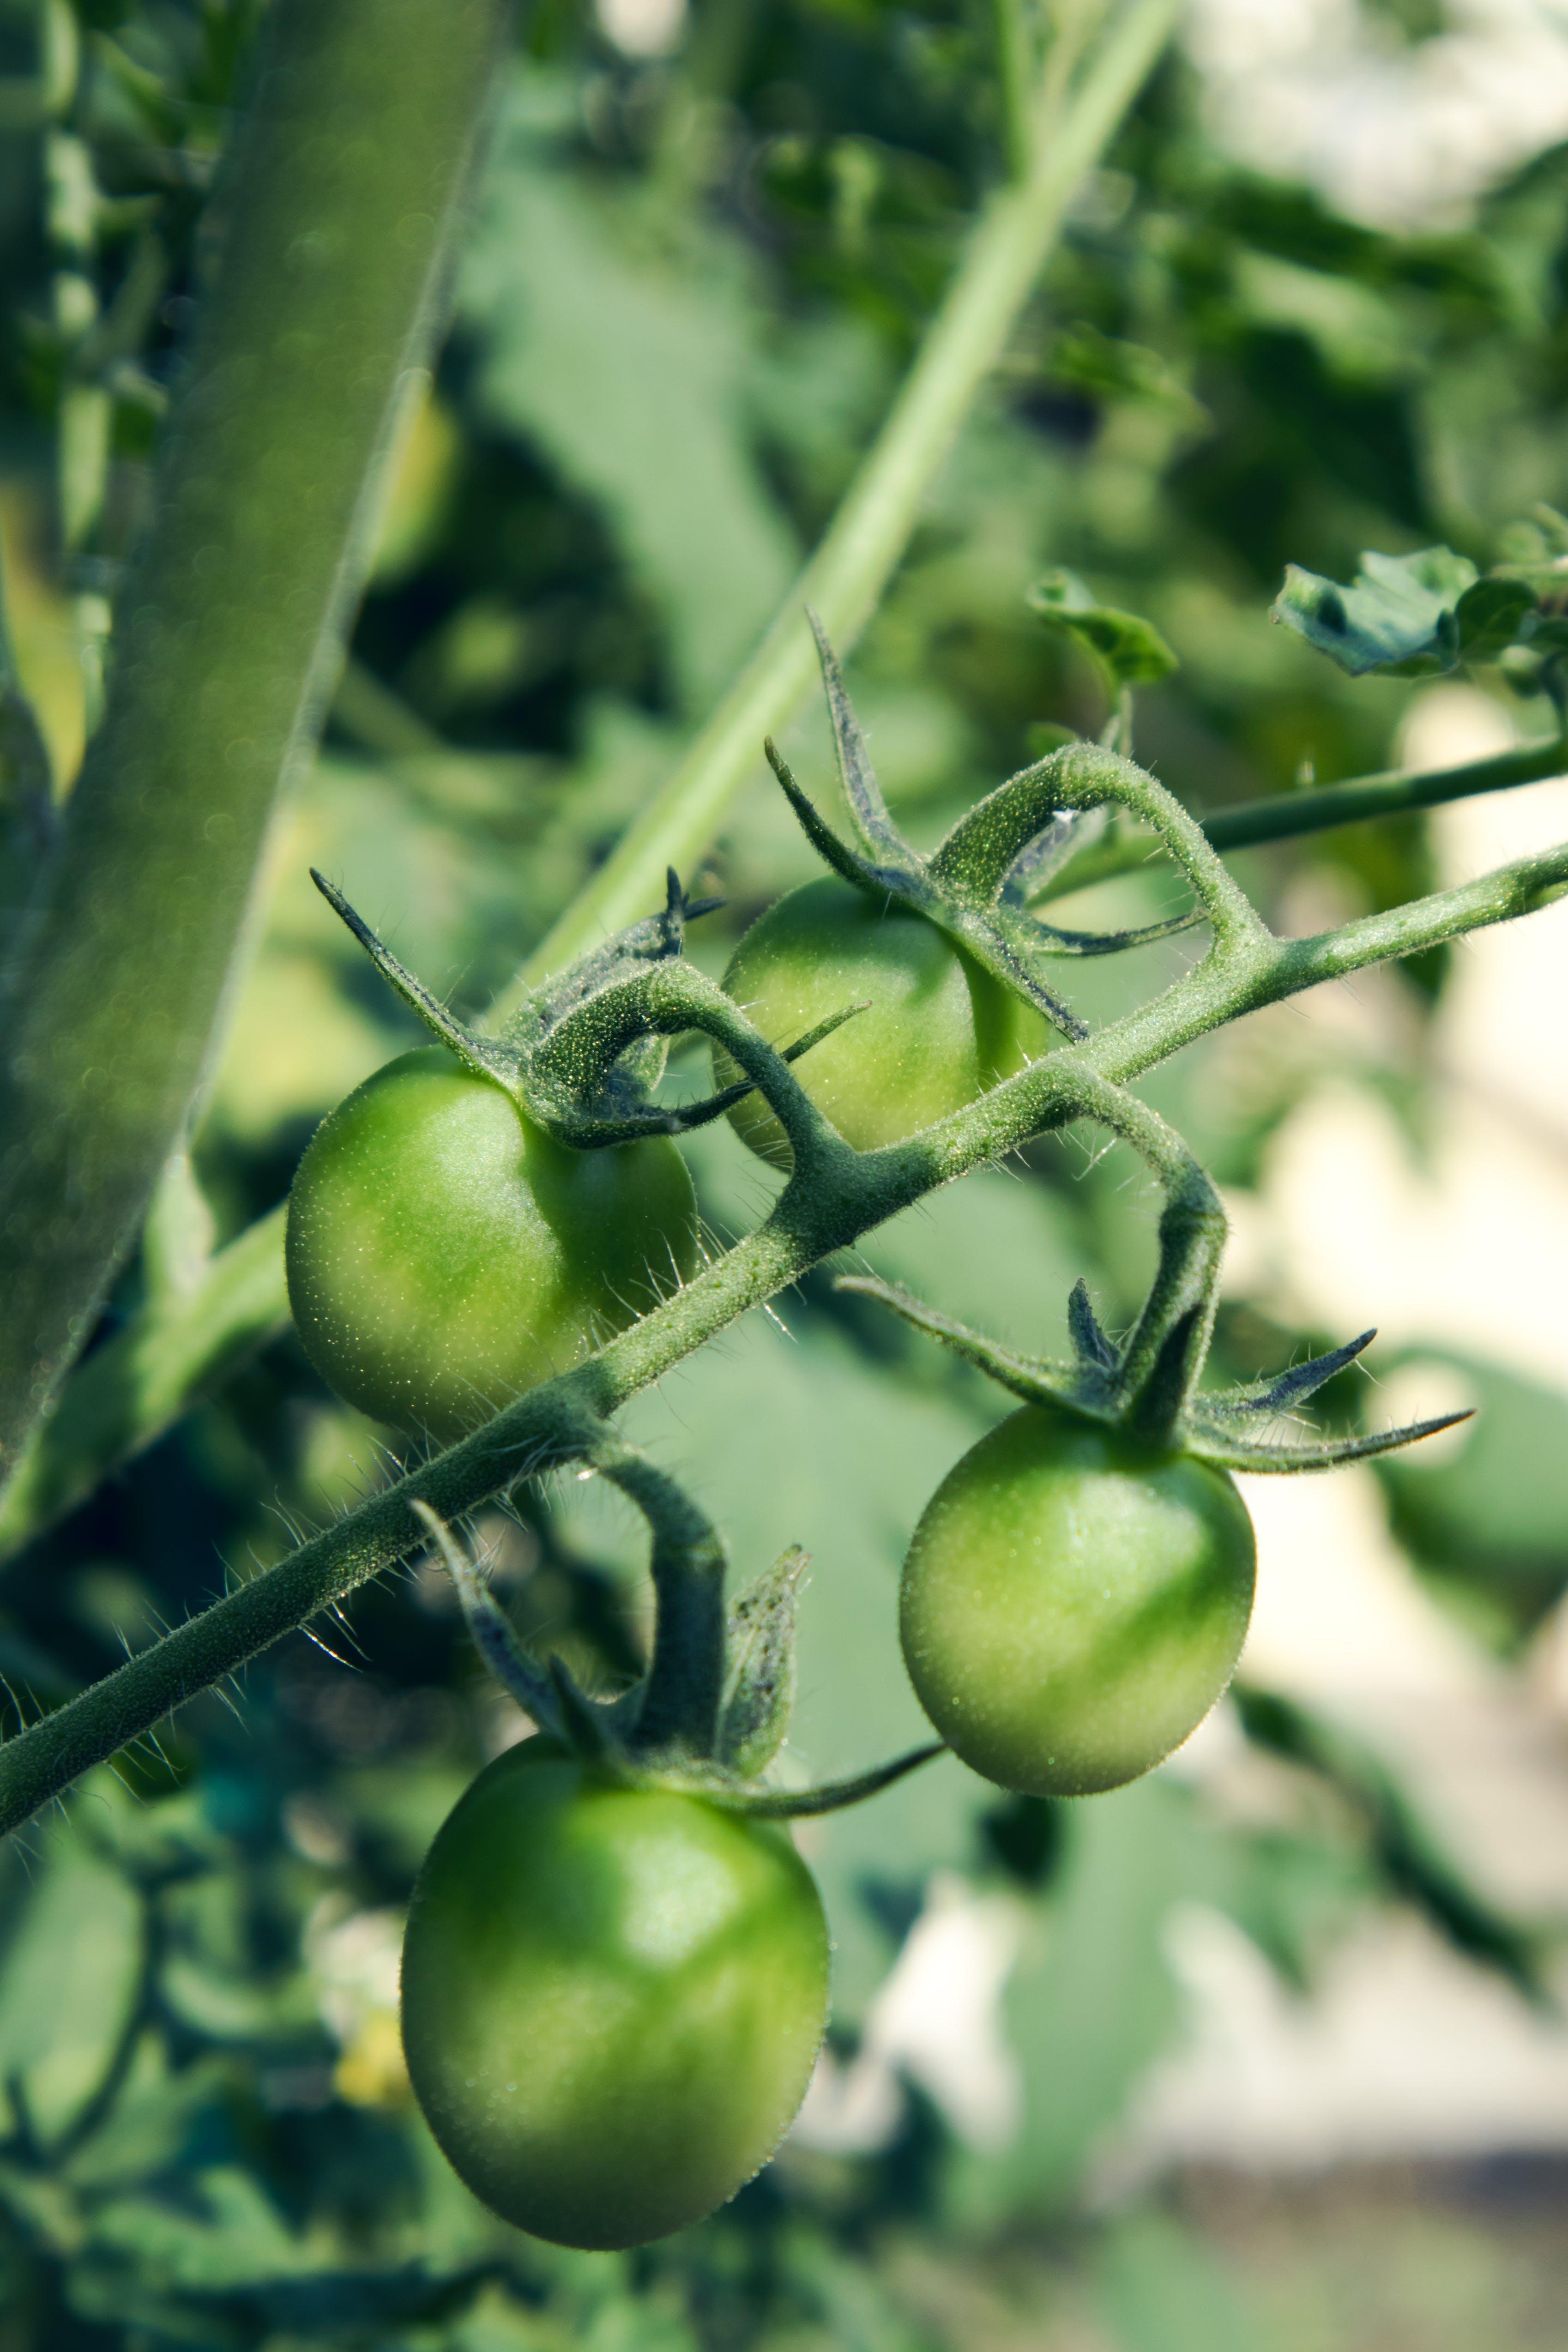 Free stock photo of cherry tomatoes